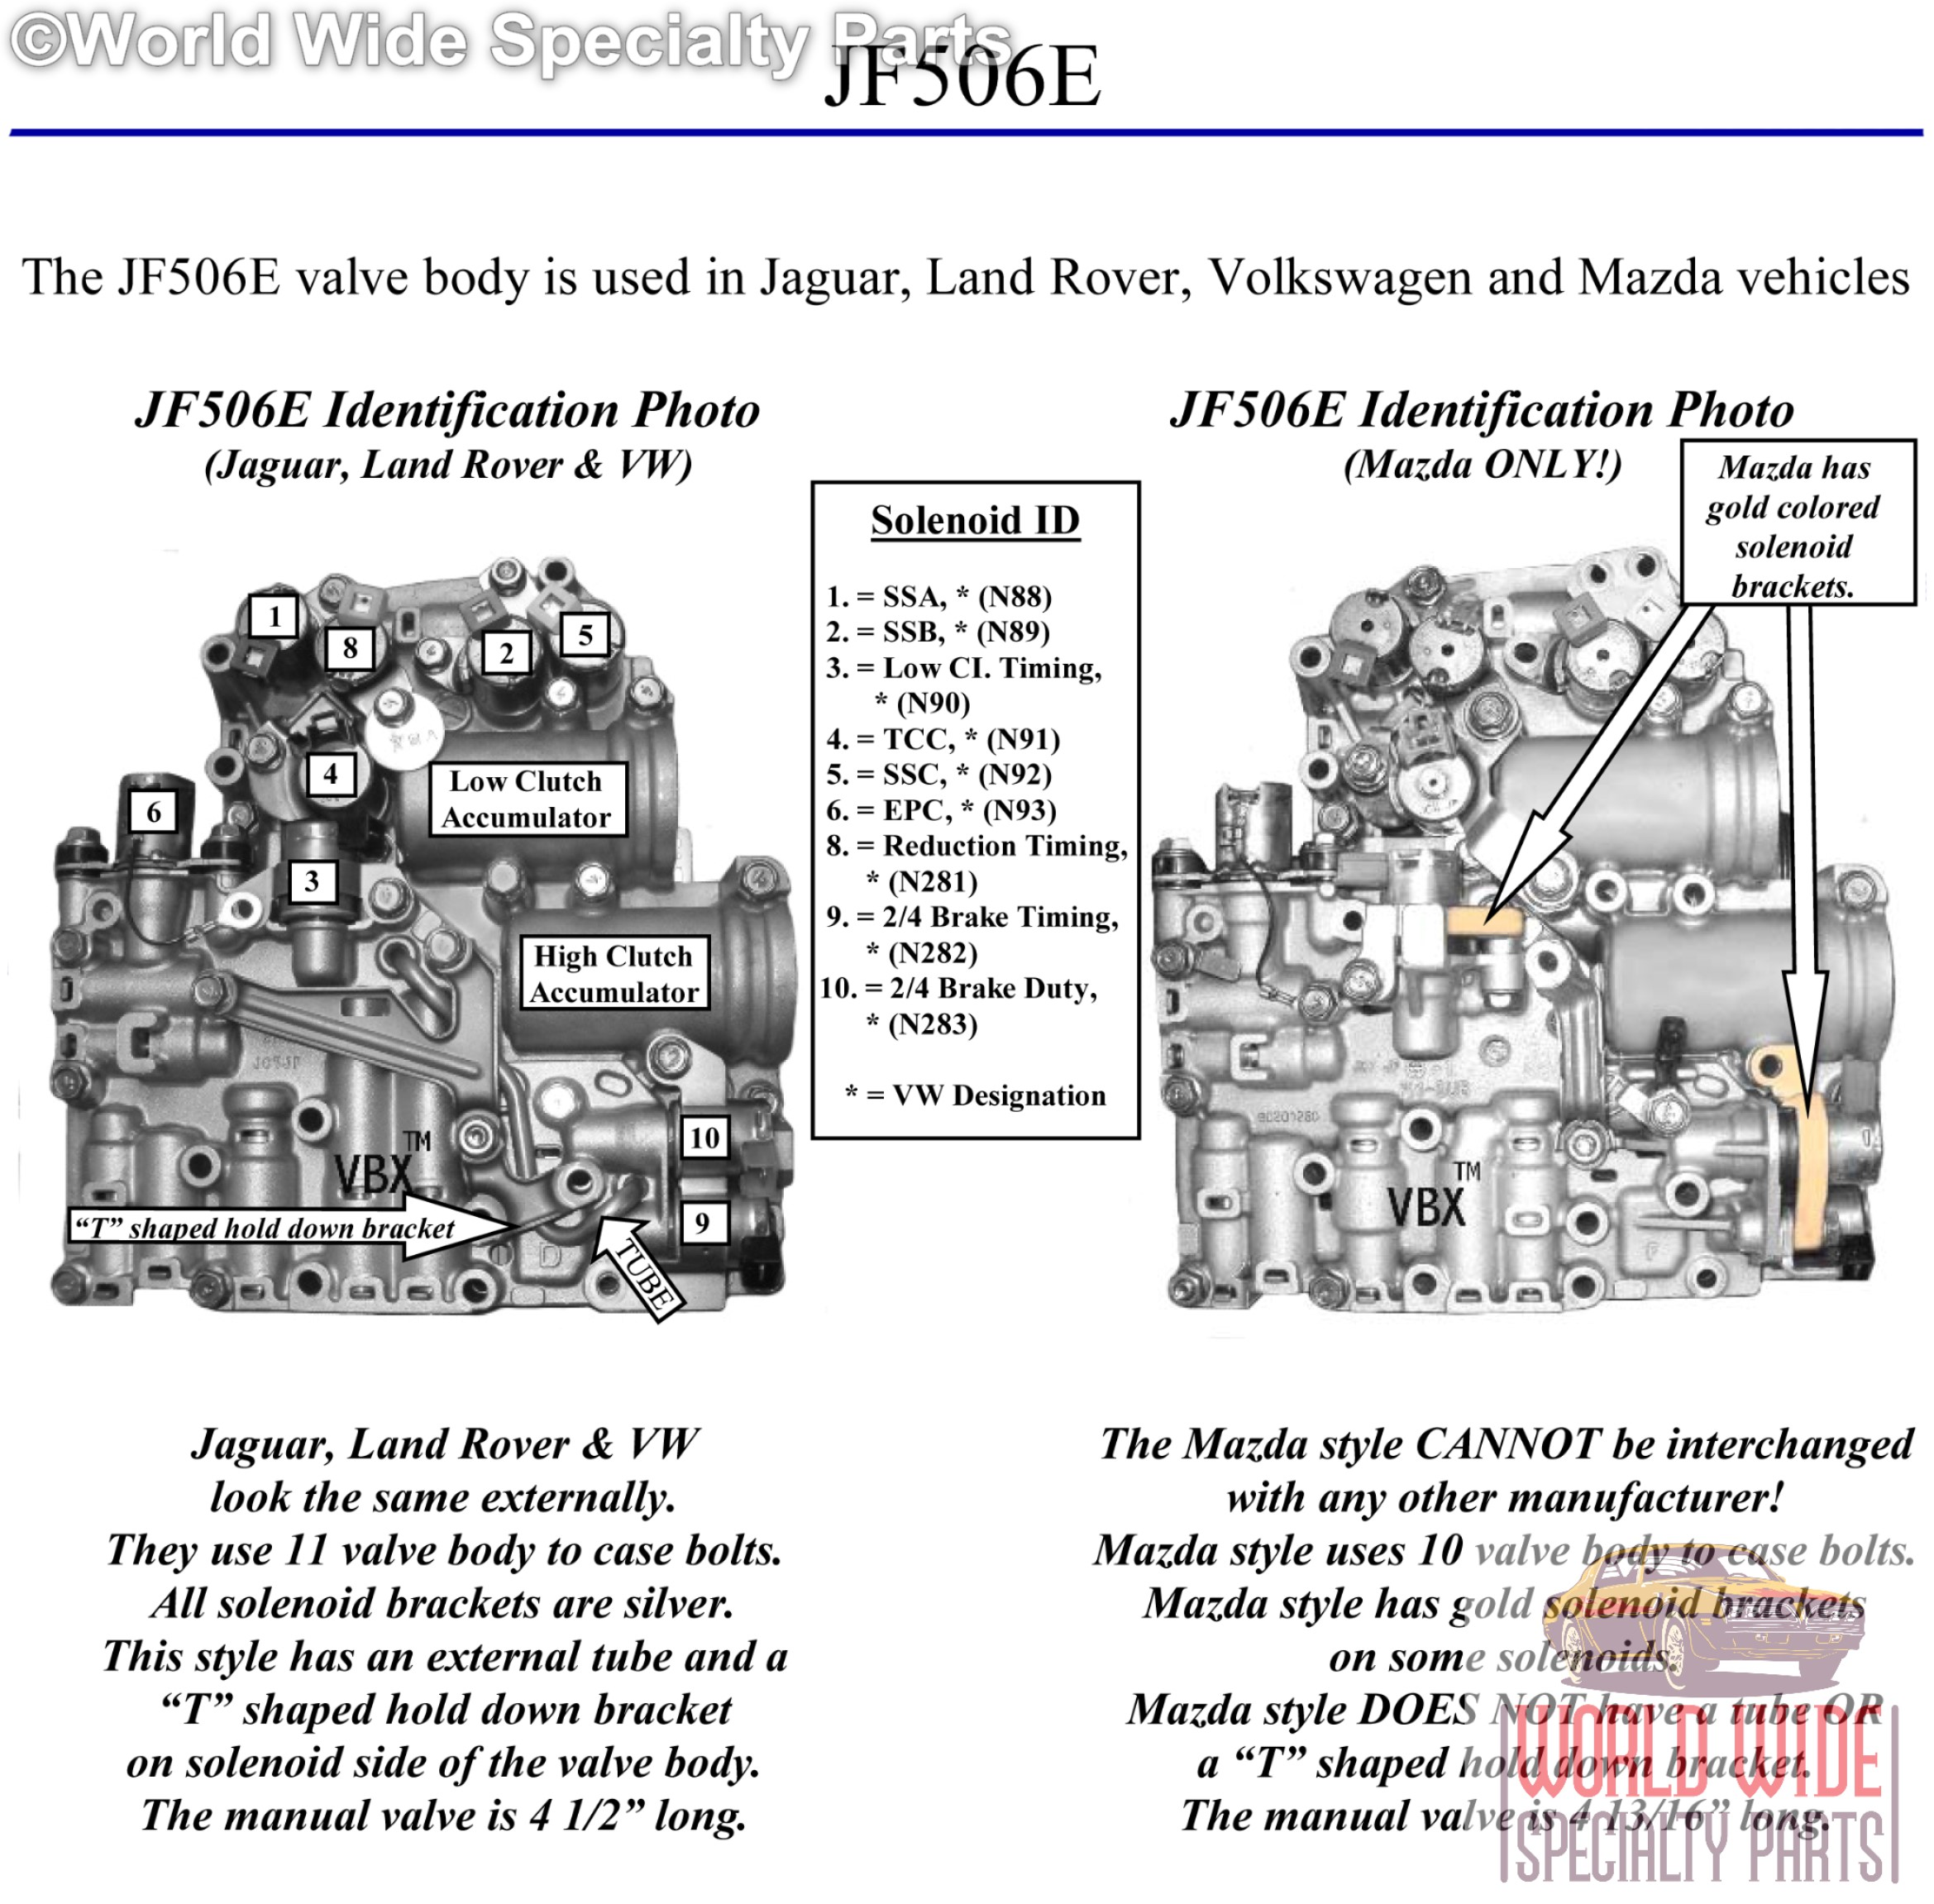 Volkswagen 09a Jf506e Valve Body Up Lifetime